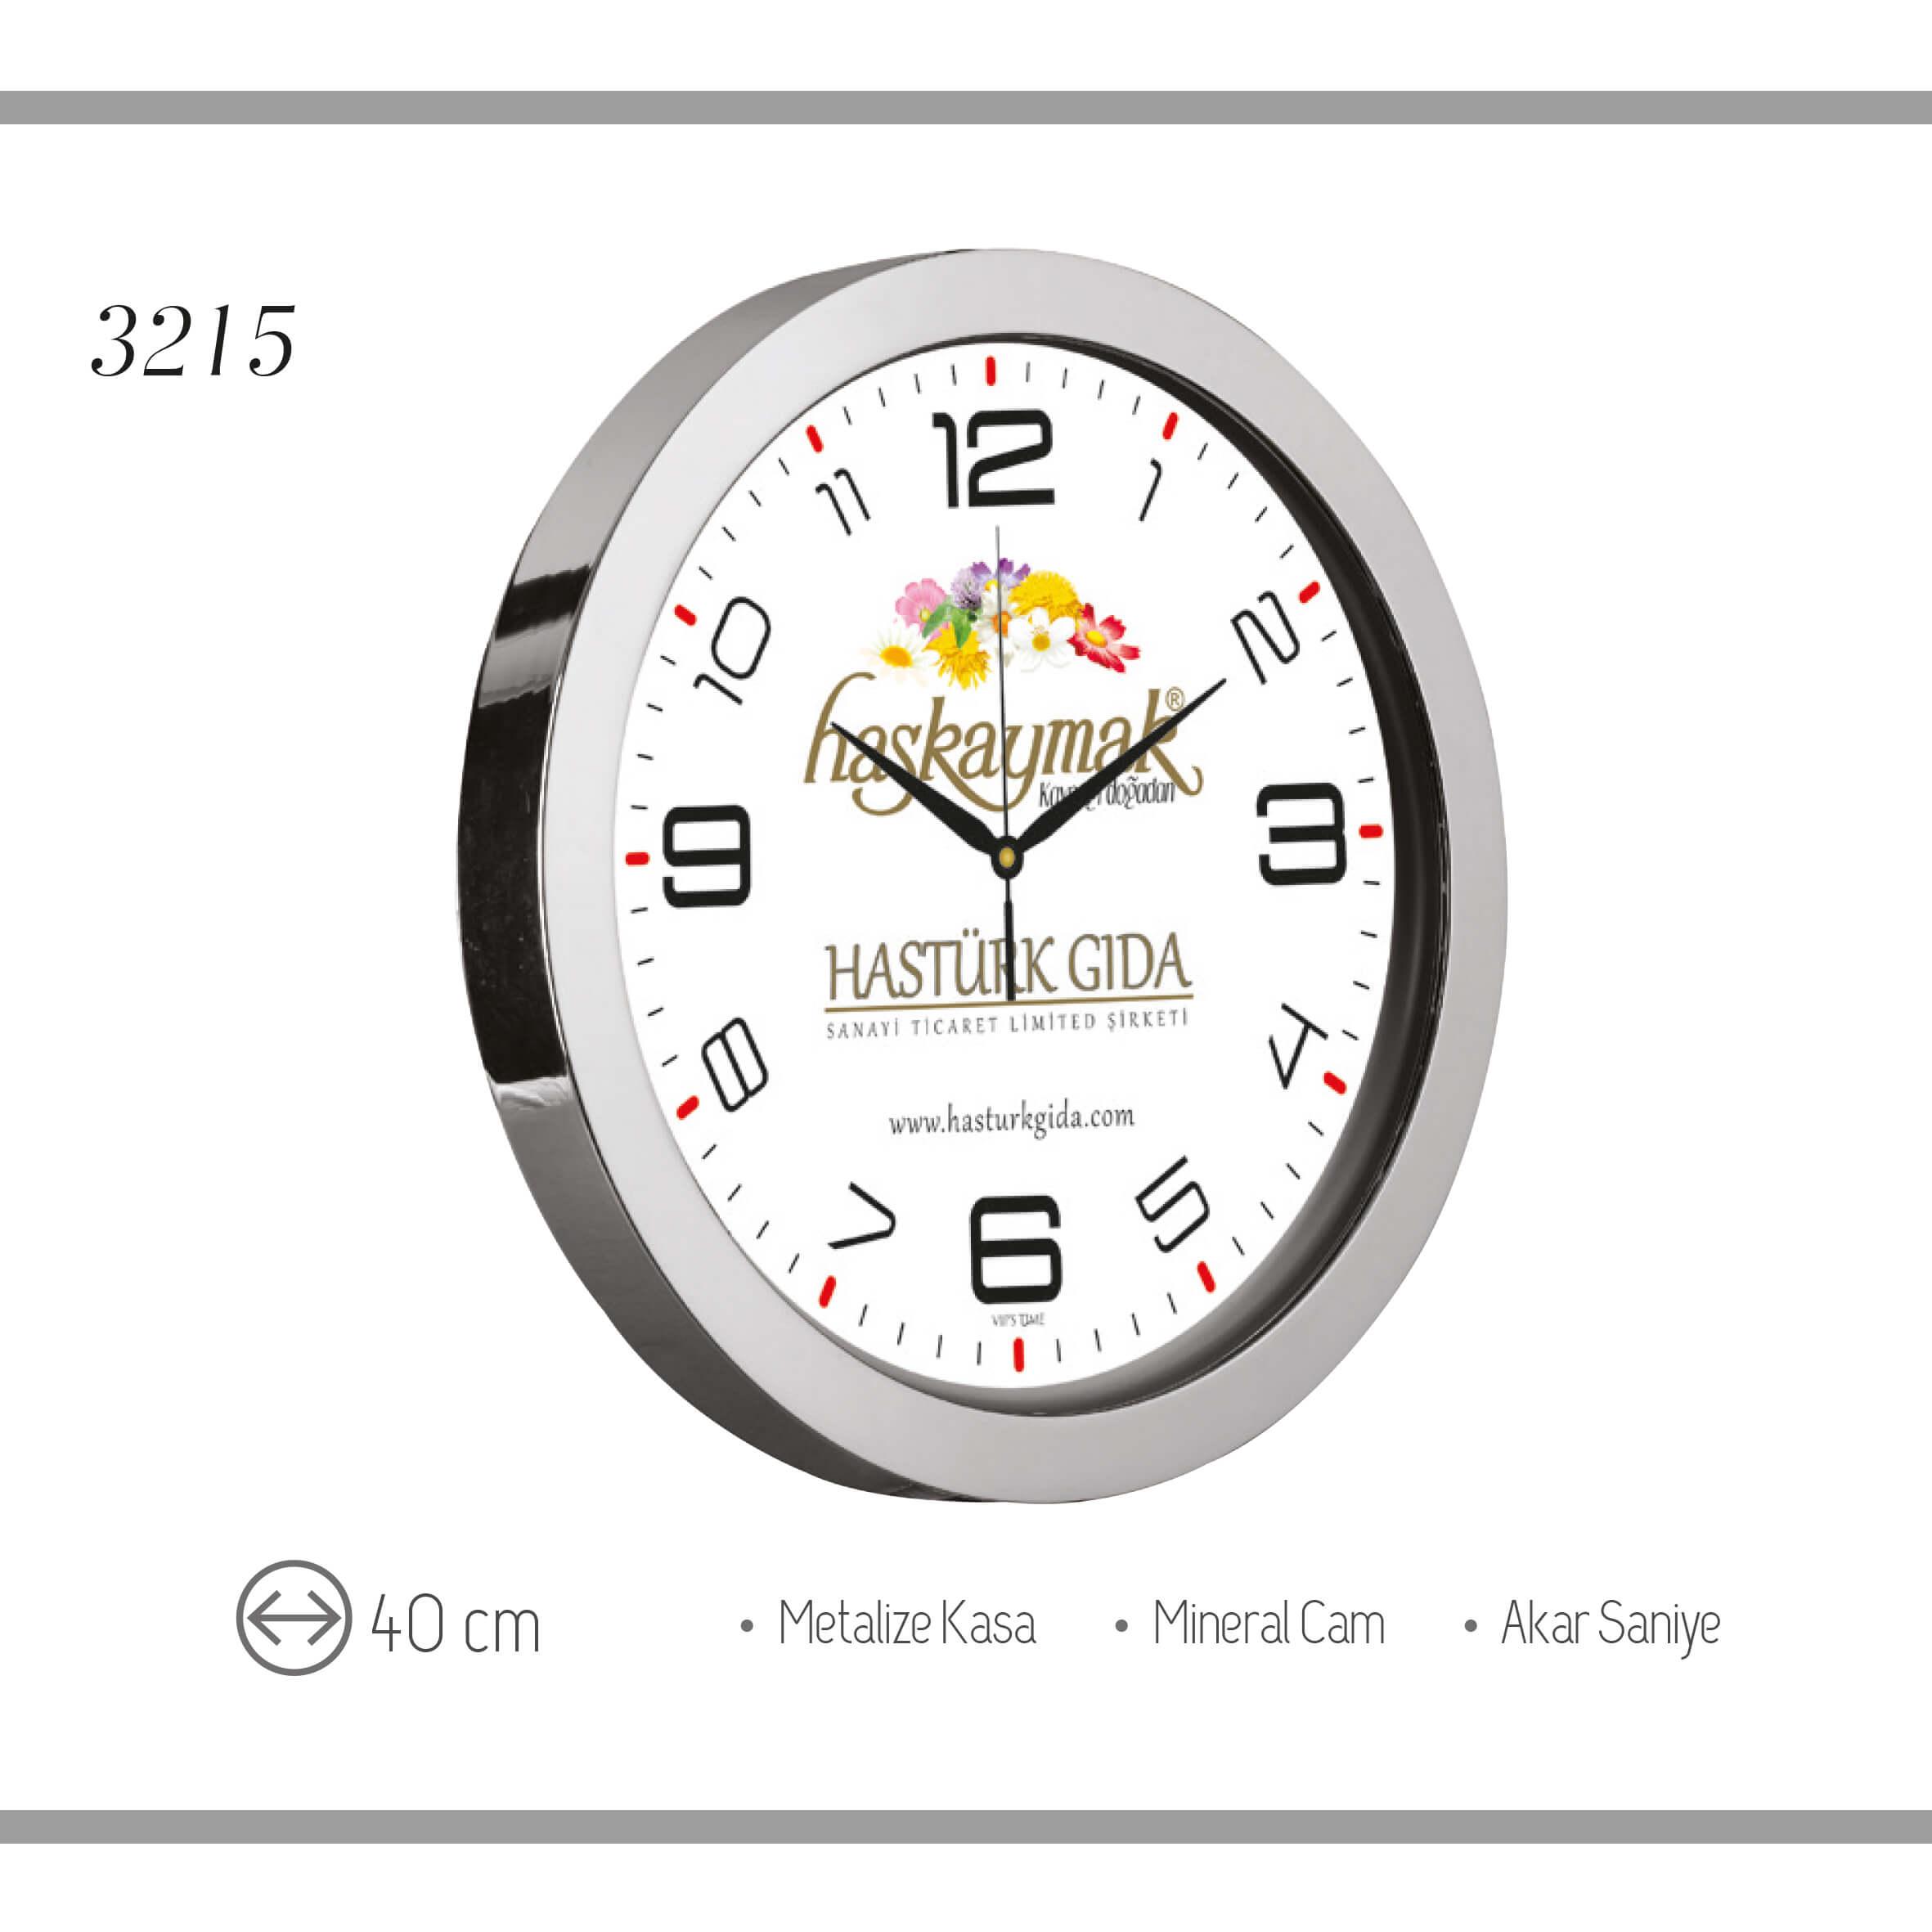 promosyon-promosyon ürünleri-promosyon saatler-duvar saatleri-promosyon duvar saati 3215